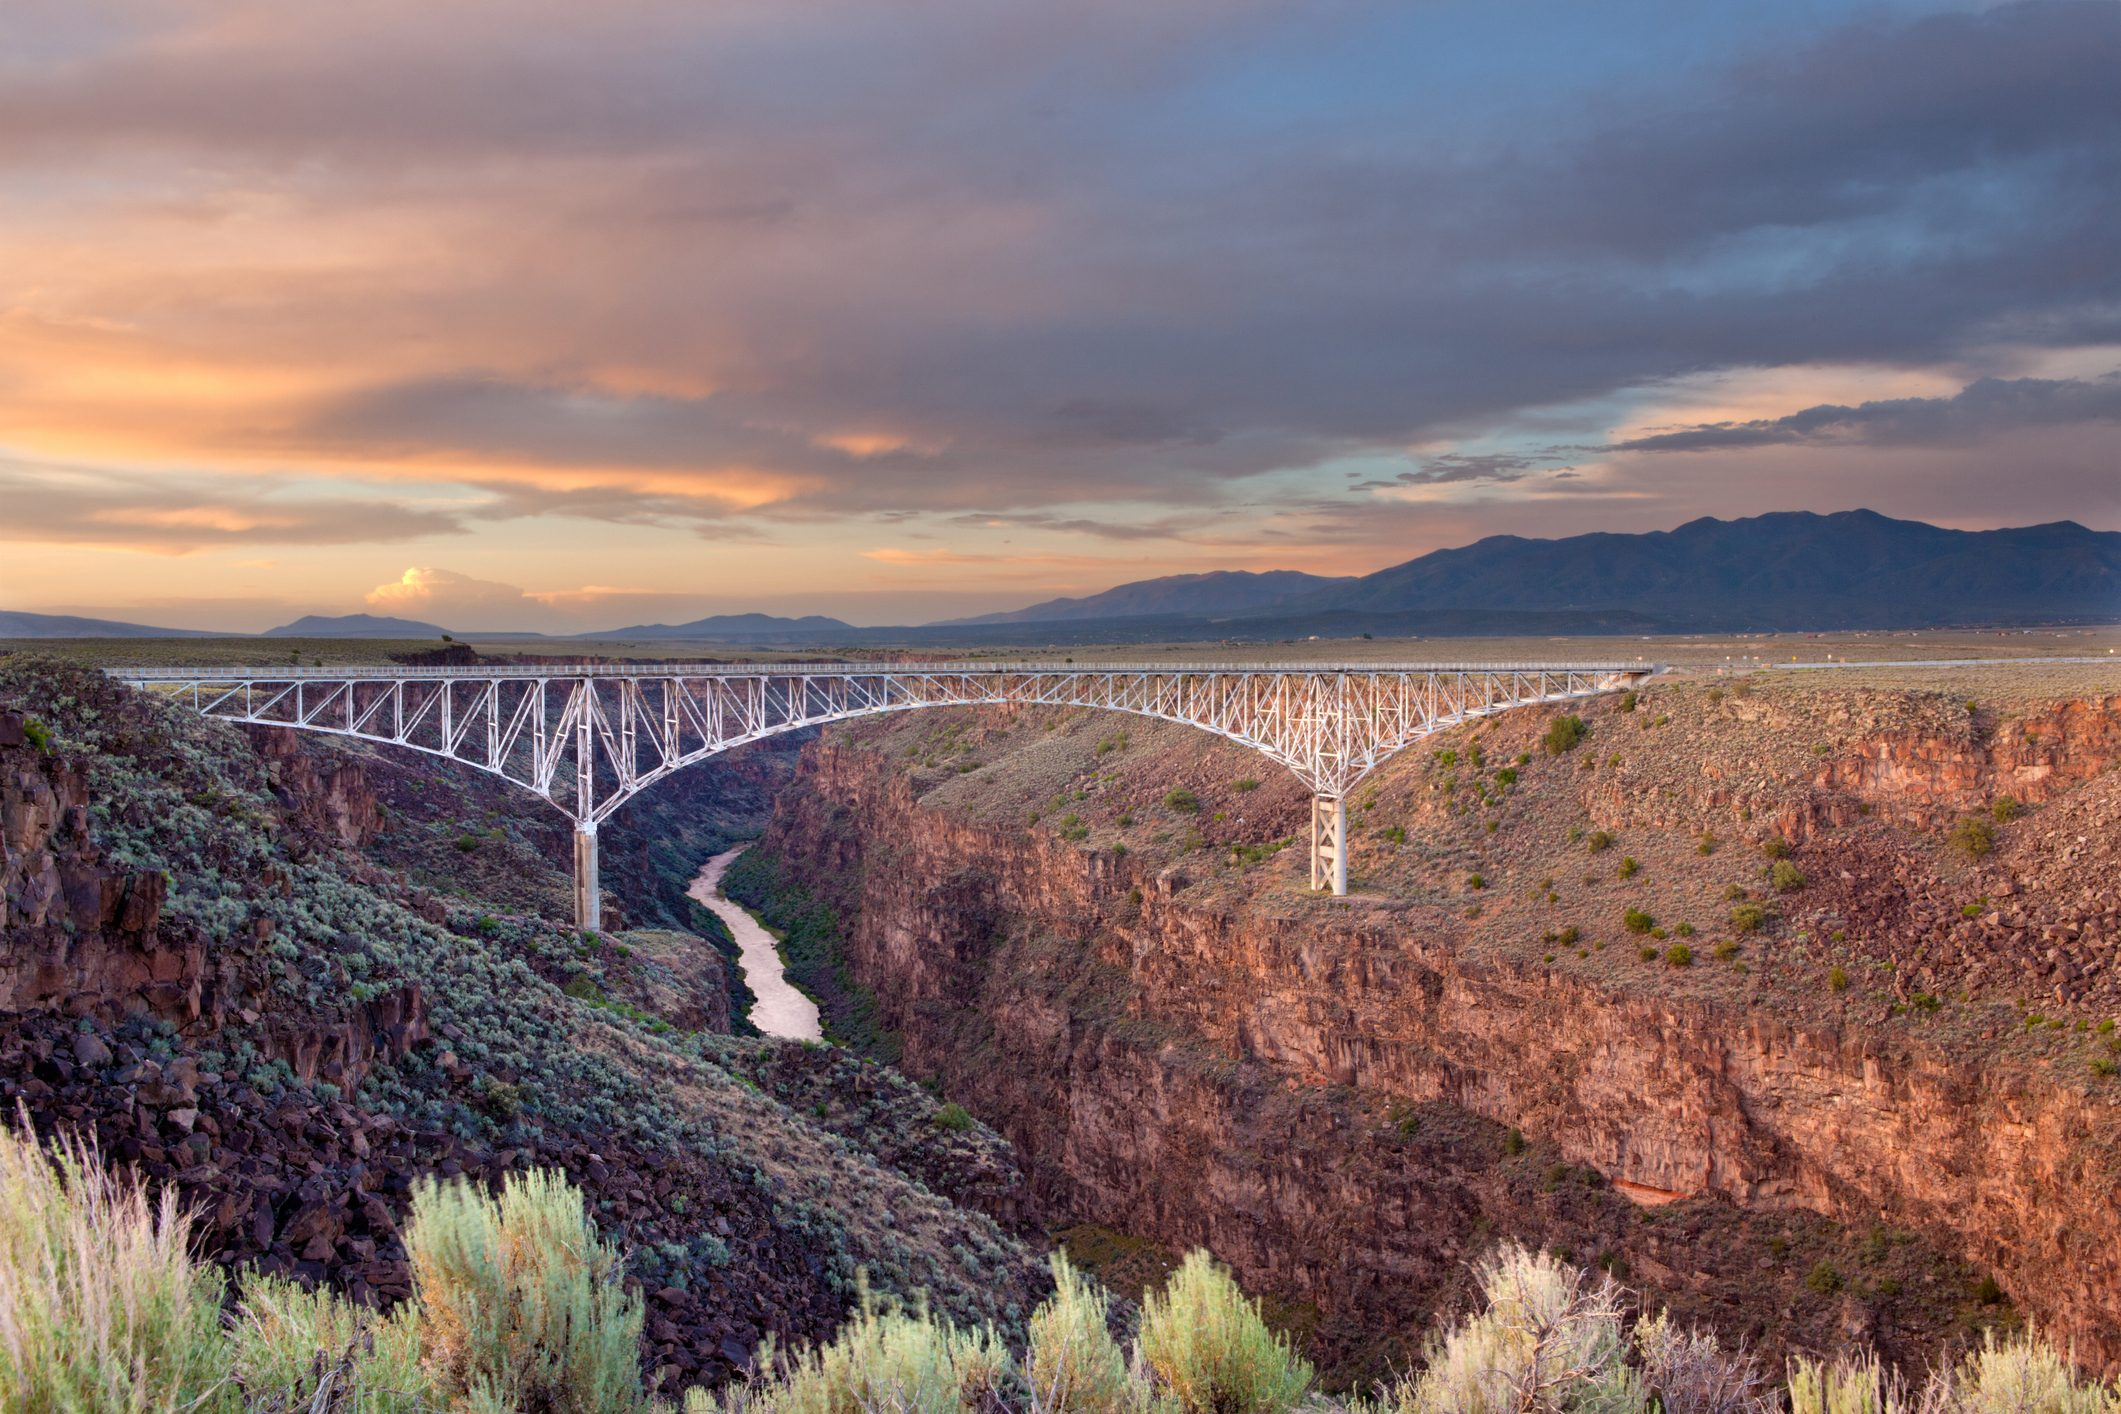 Rio Grande Gorge Bridge, Taos County, New Mexico